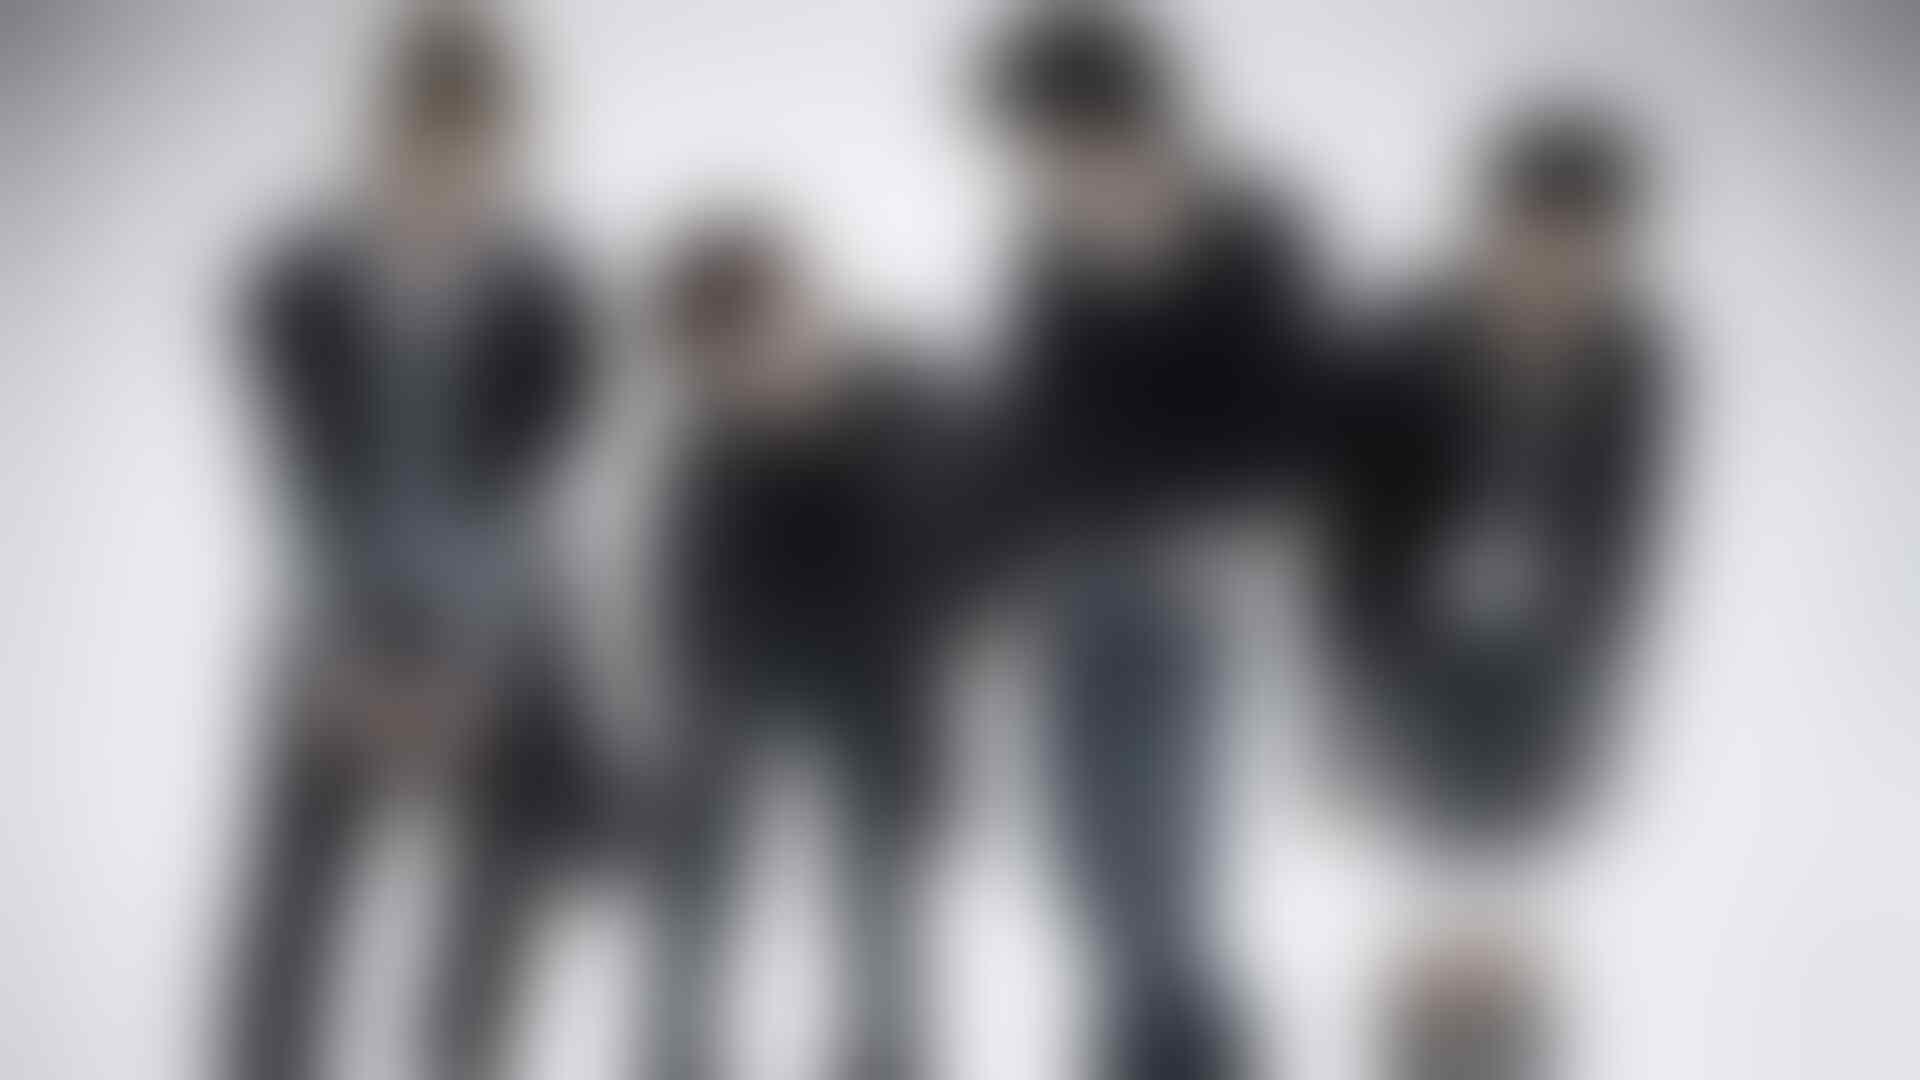 8 Boy Band Korea yang Hits di Tahun 2000an, Tahukah Kamu?